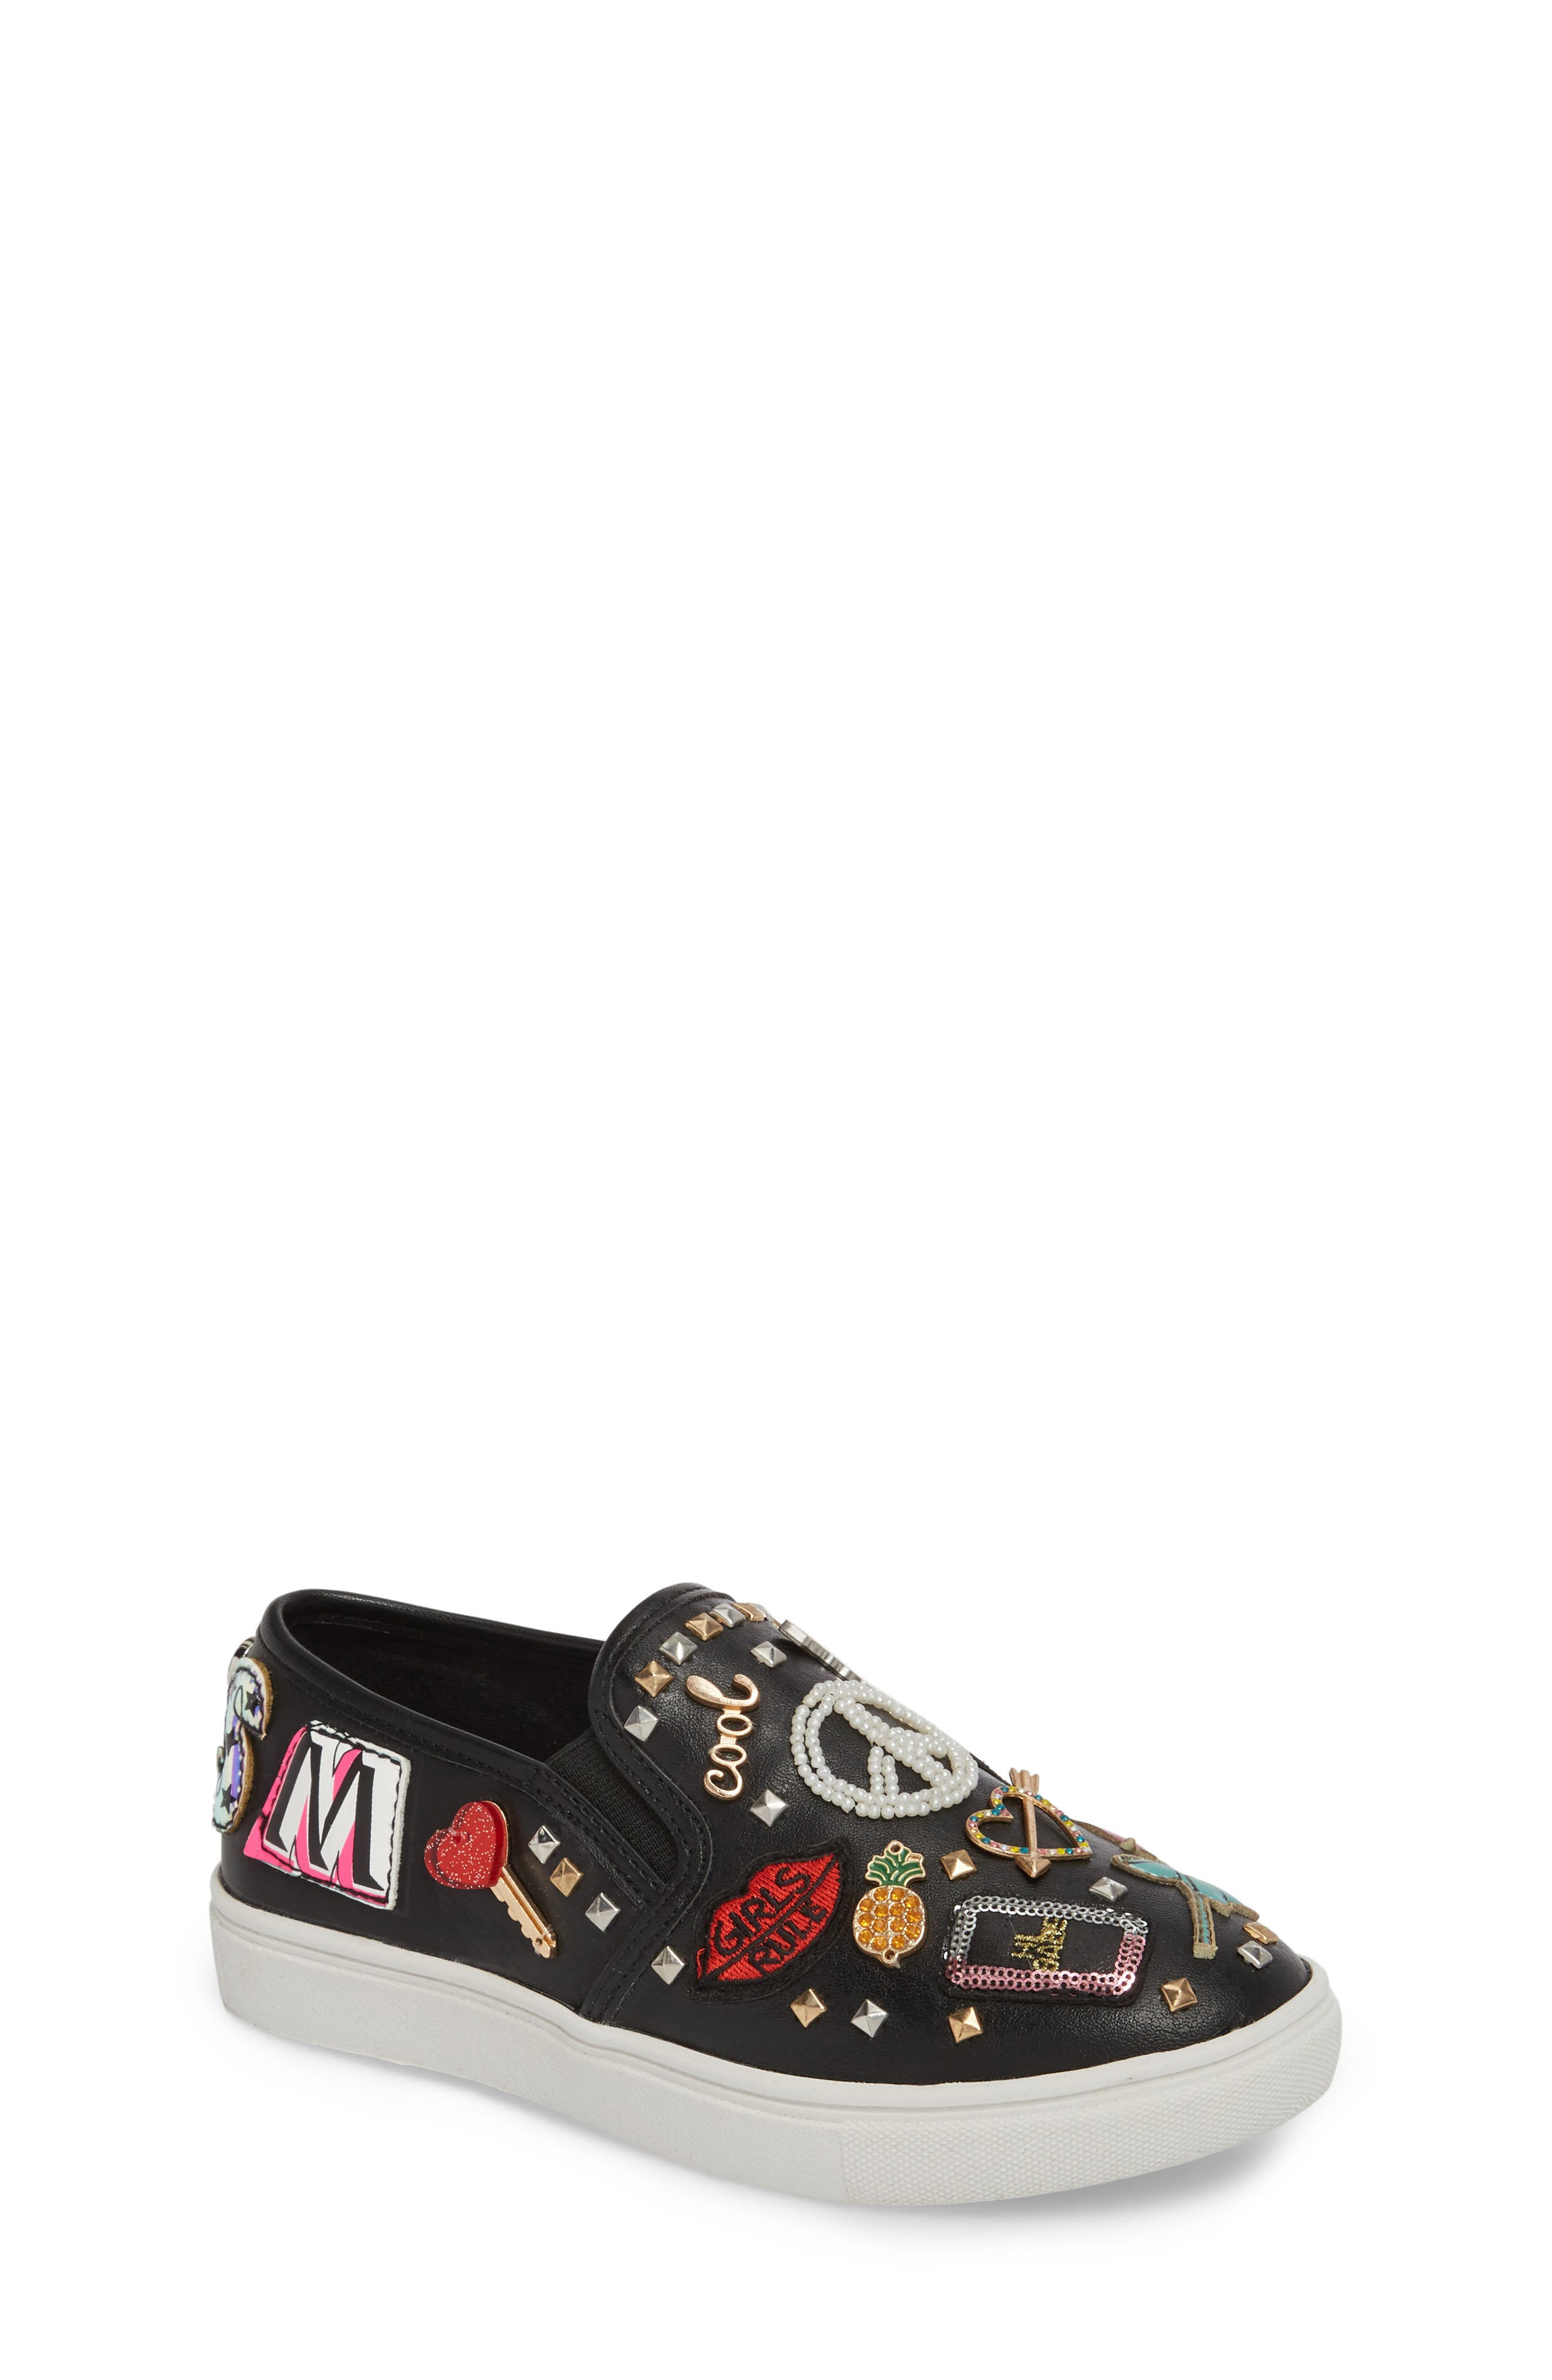 JCraze Embellished Slip-On Sneaker,                             Main thumbnail 1, color,                             Black